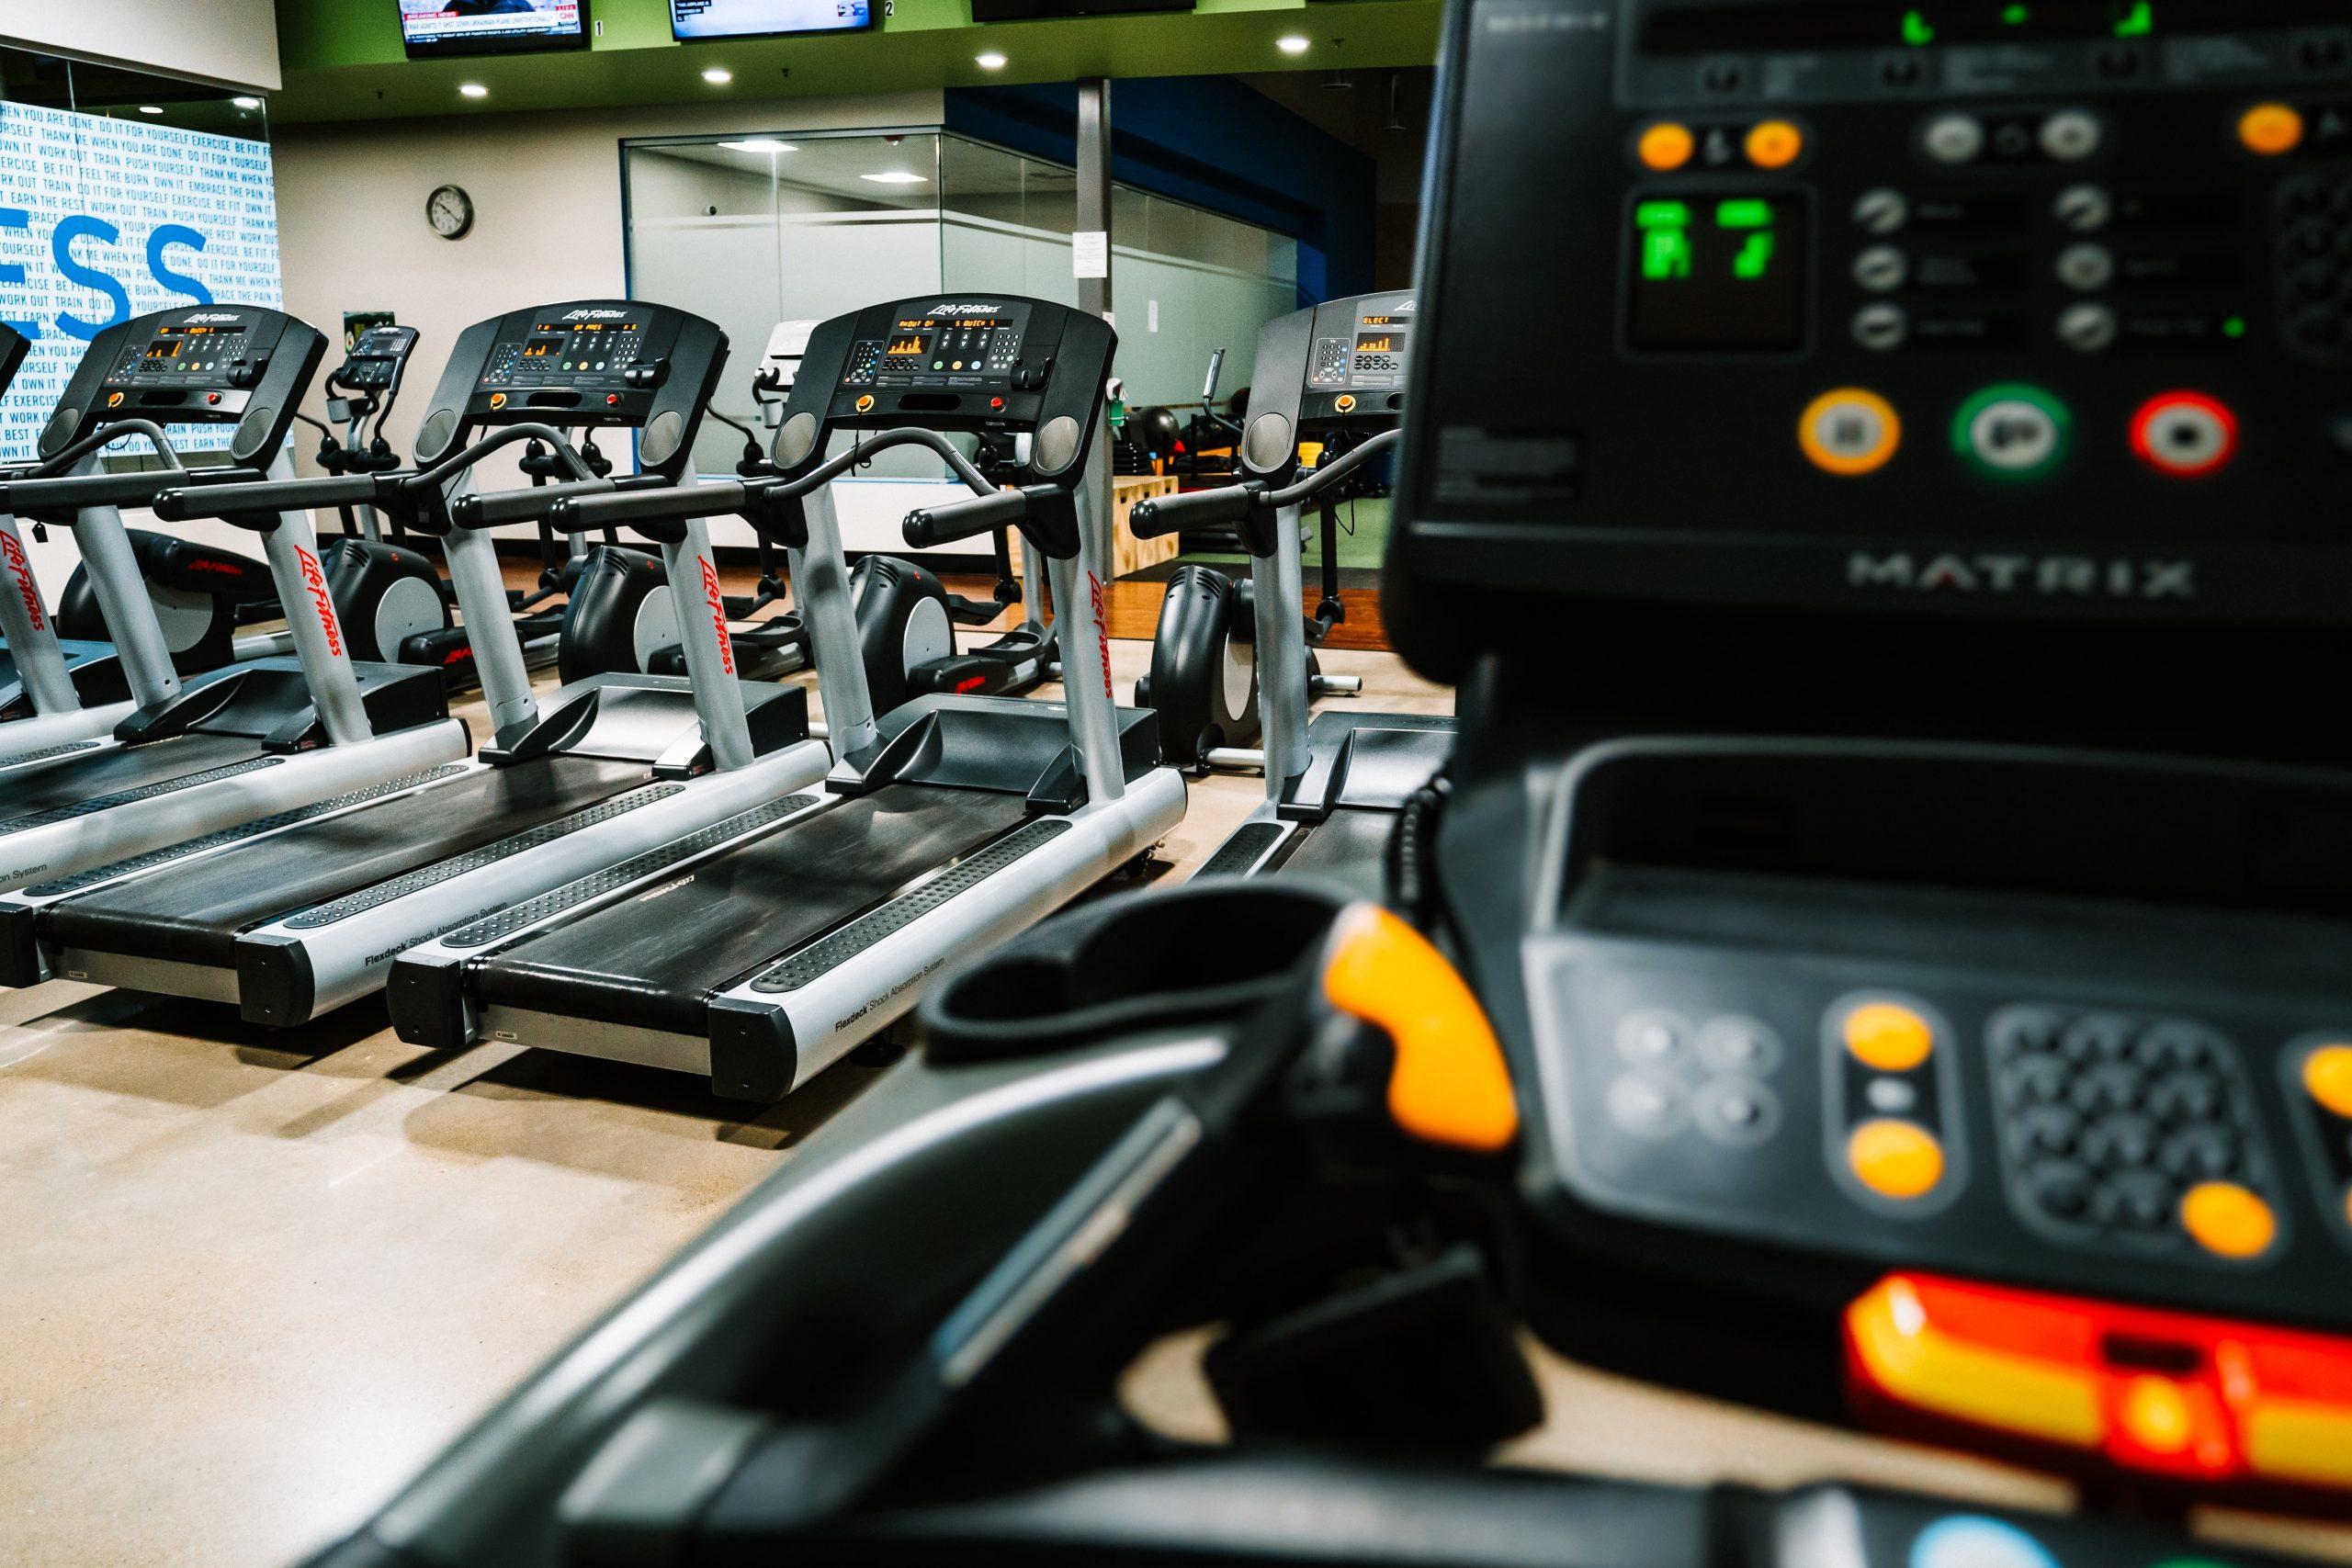 empty gym. Photo by Ryan de Hamer on Unsplash